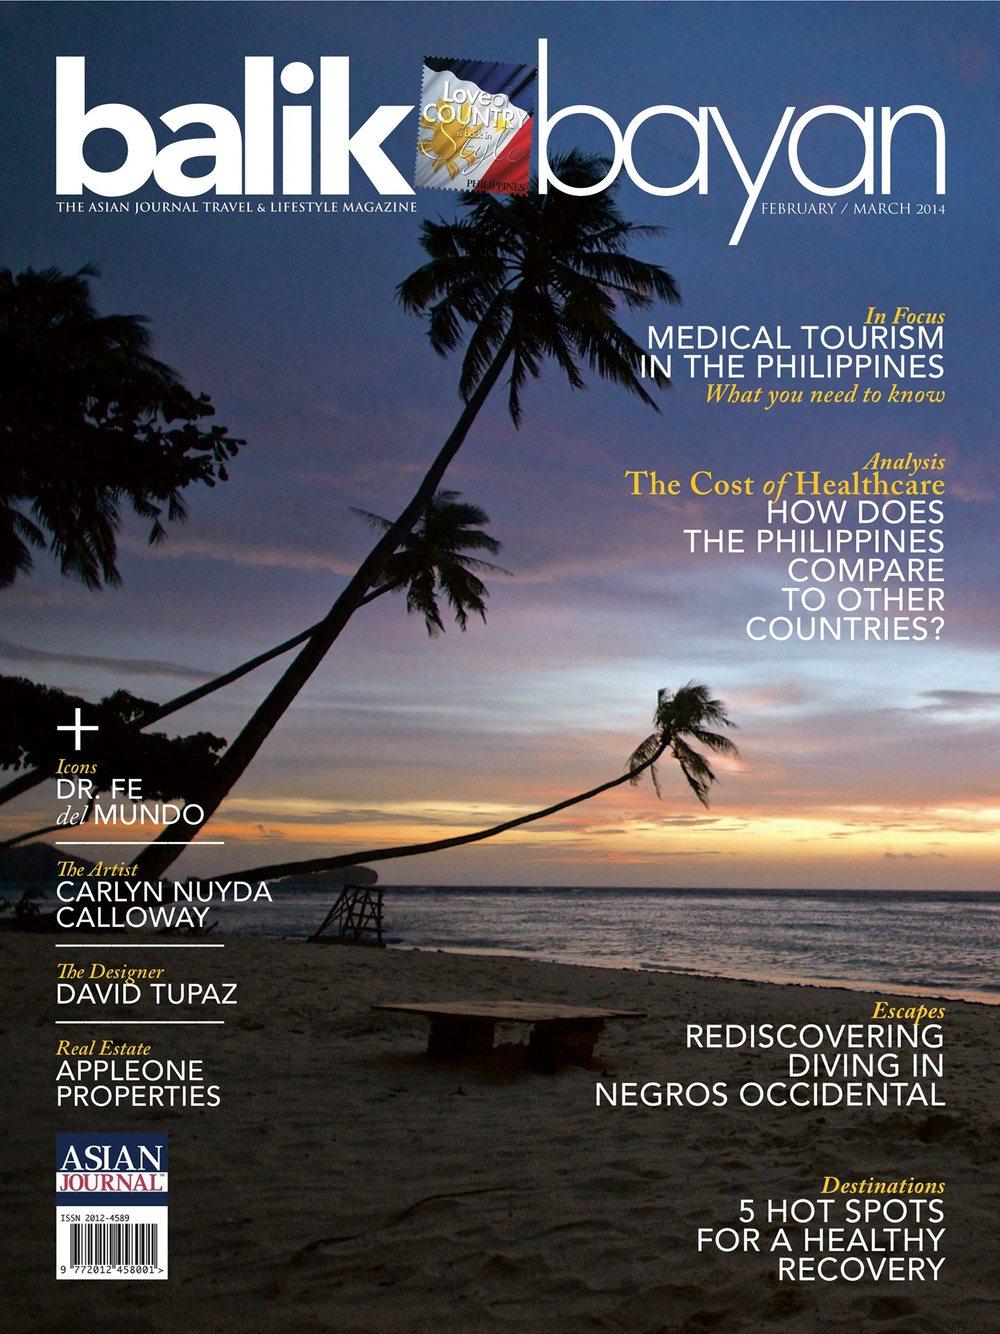 Link:http://issuu.com/bbmag-digital/docs/balikbayan_magazine_v5n1?e=2147944%2F6623171